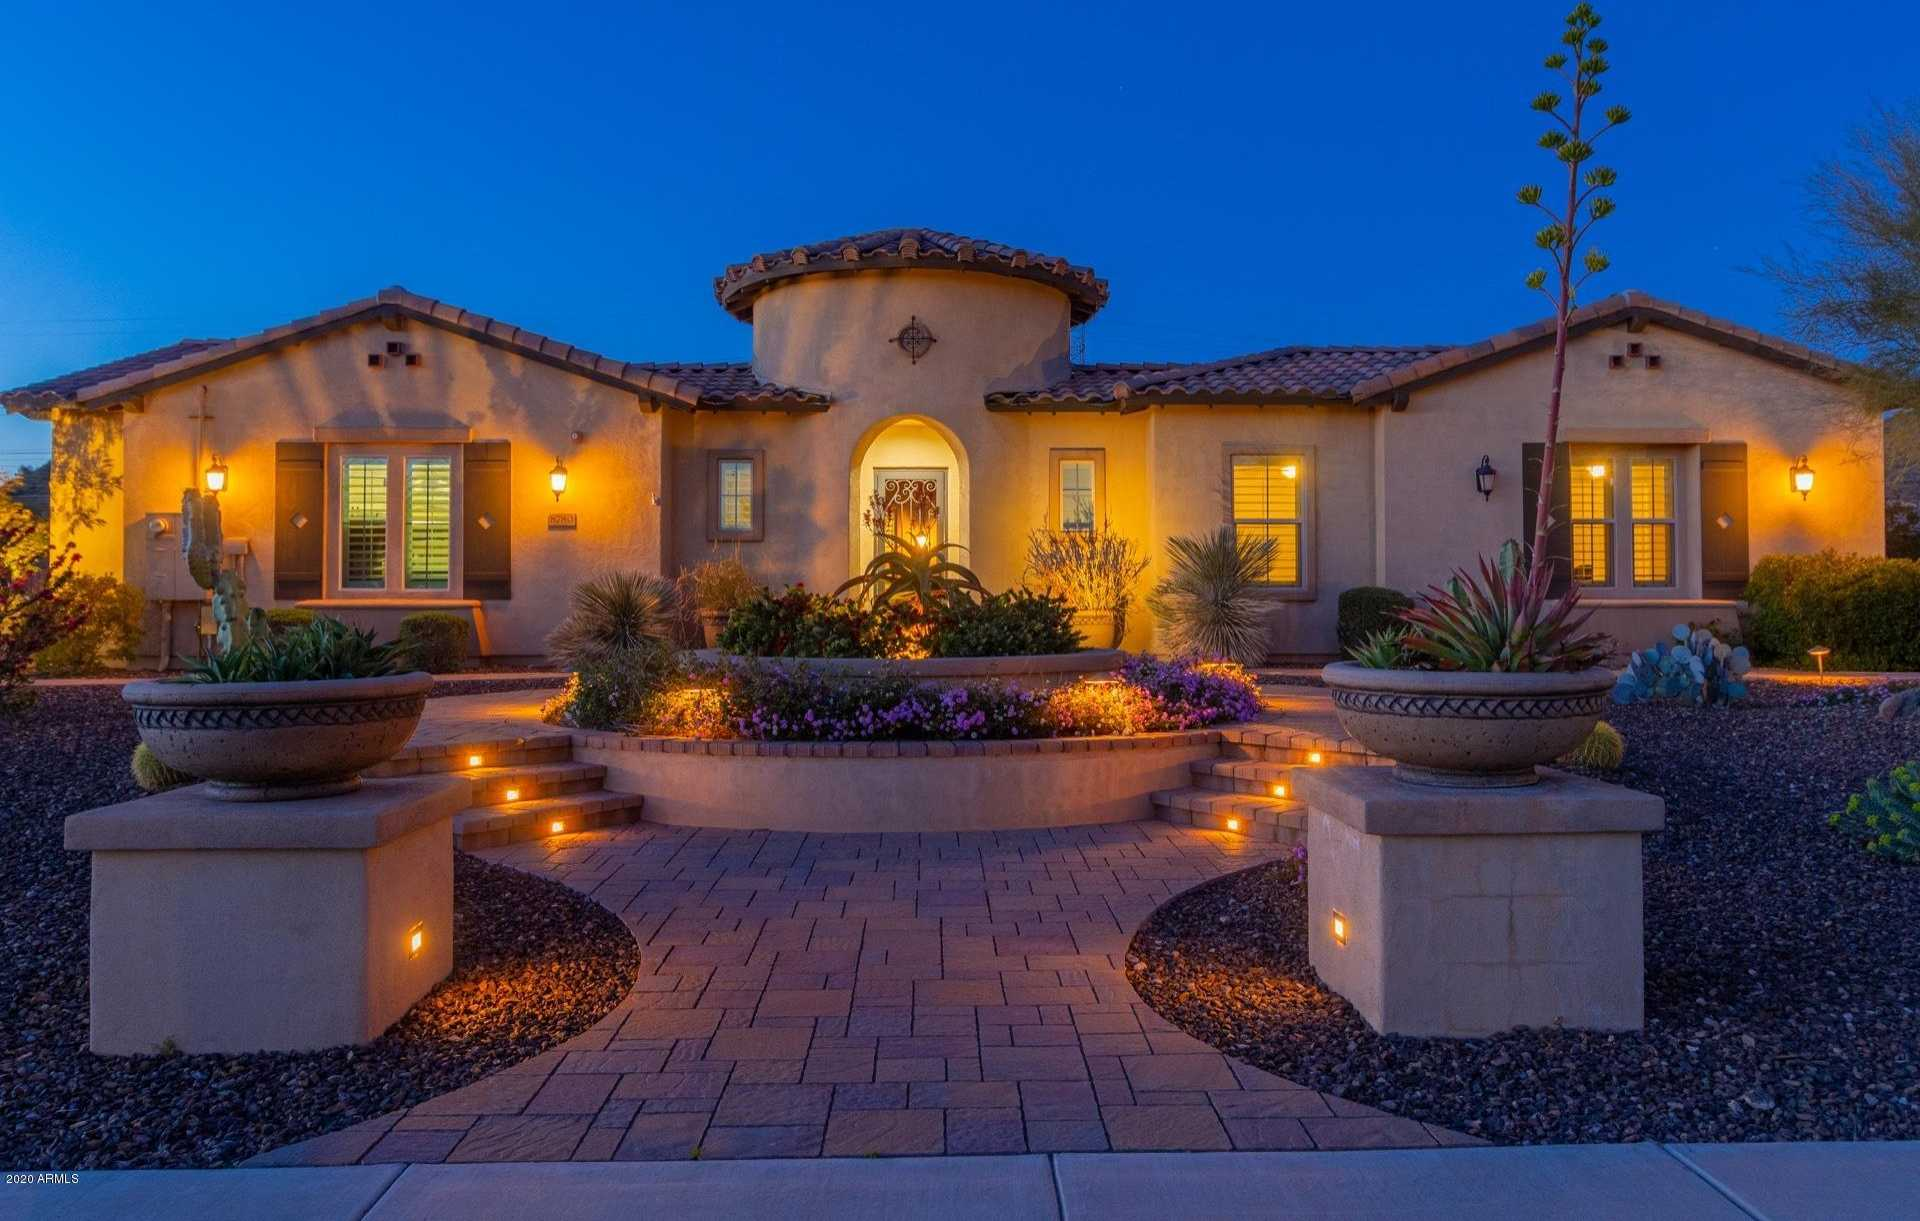 $1,250,000 - 5Br/5Ba - Home for Sale in Ventana Picachos, Peoria